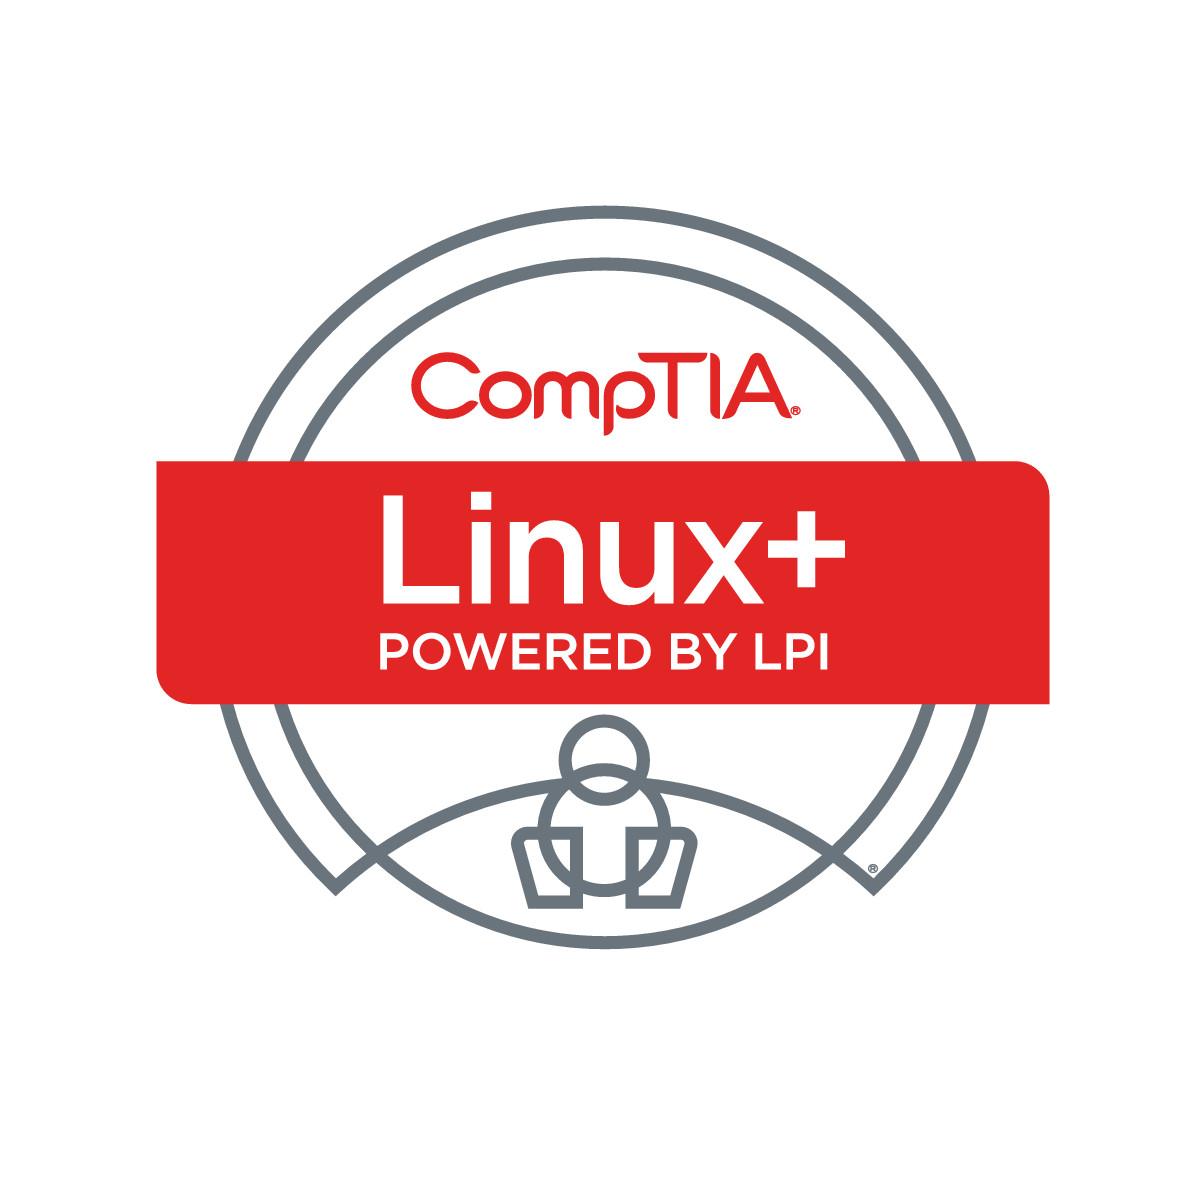 CompTIA Linux+ Logo